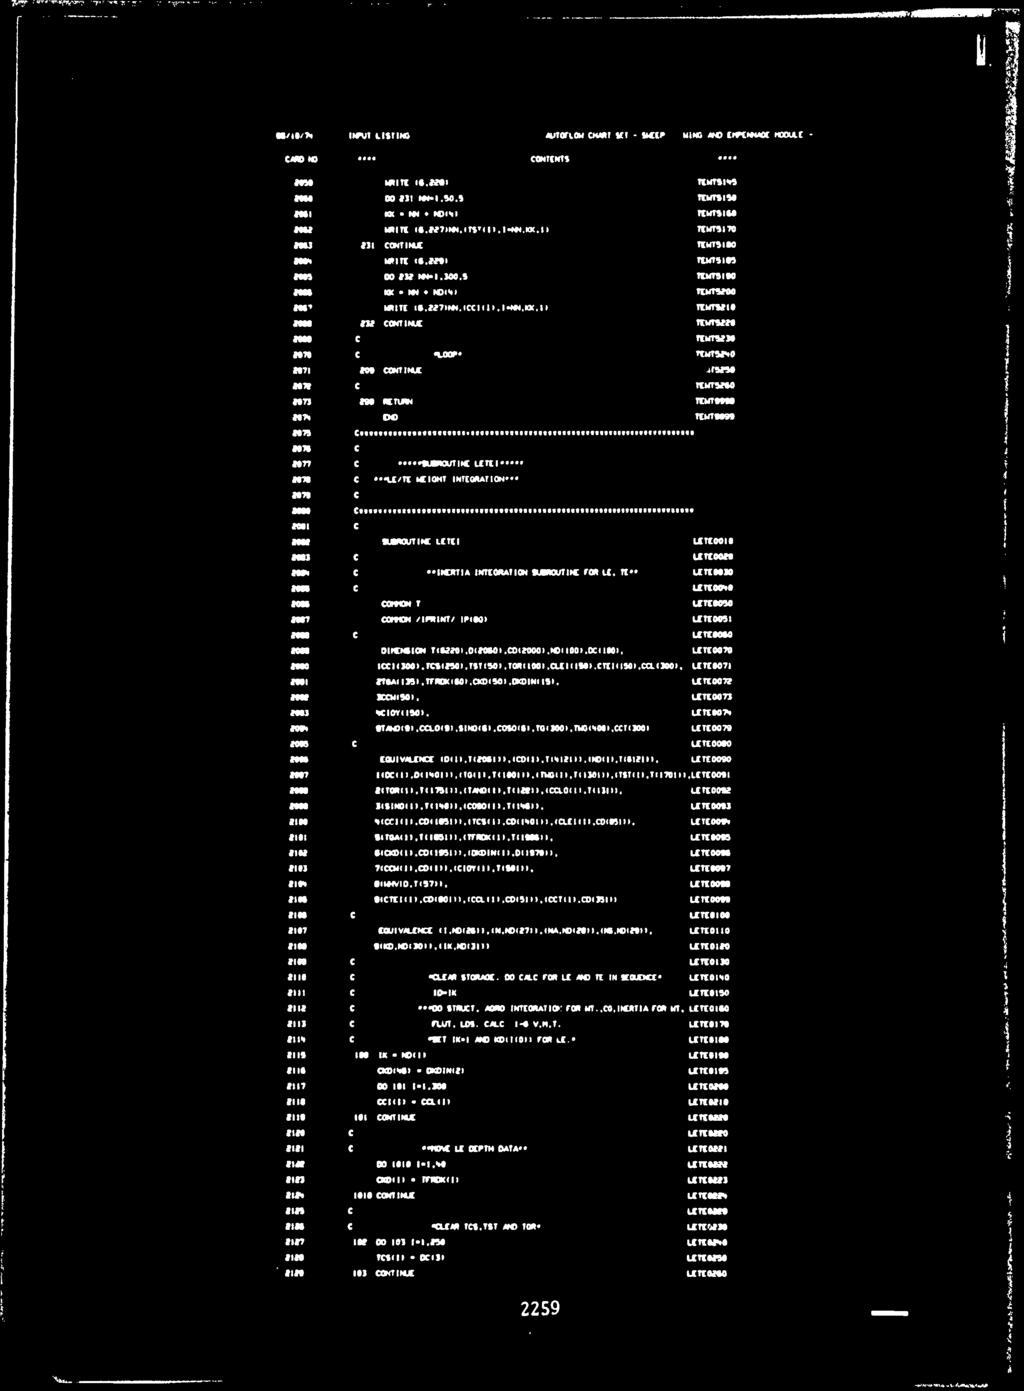 aton demo konts